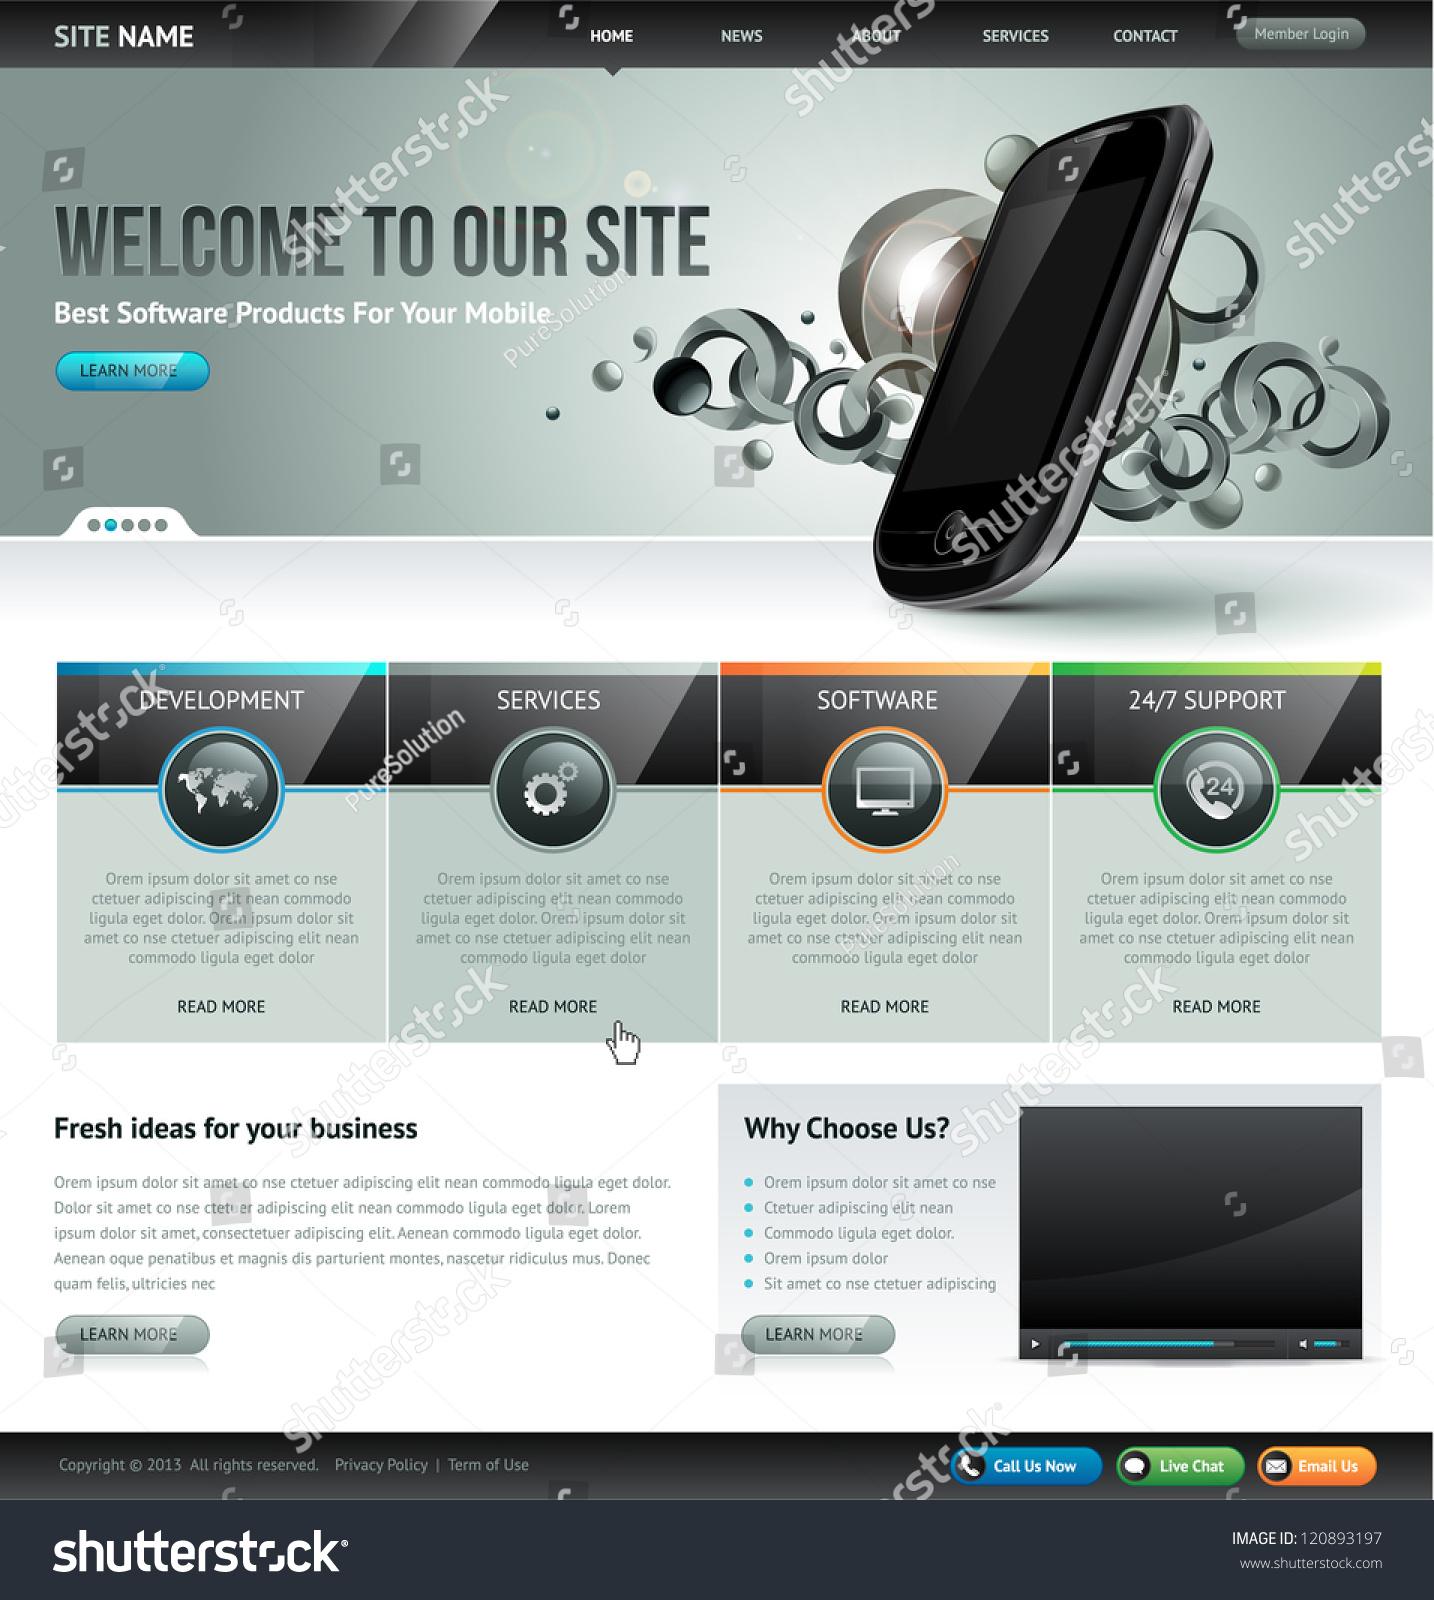 Online image photo editor shutterstock editor for Website layout maker